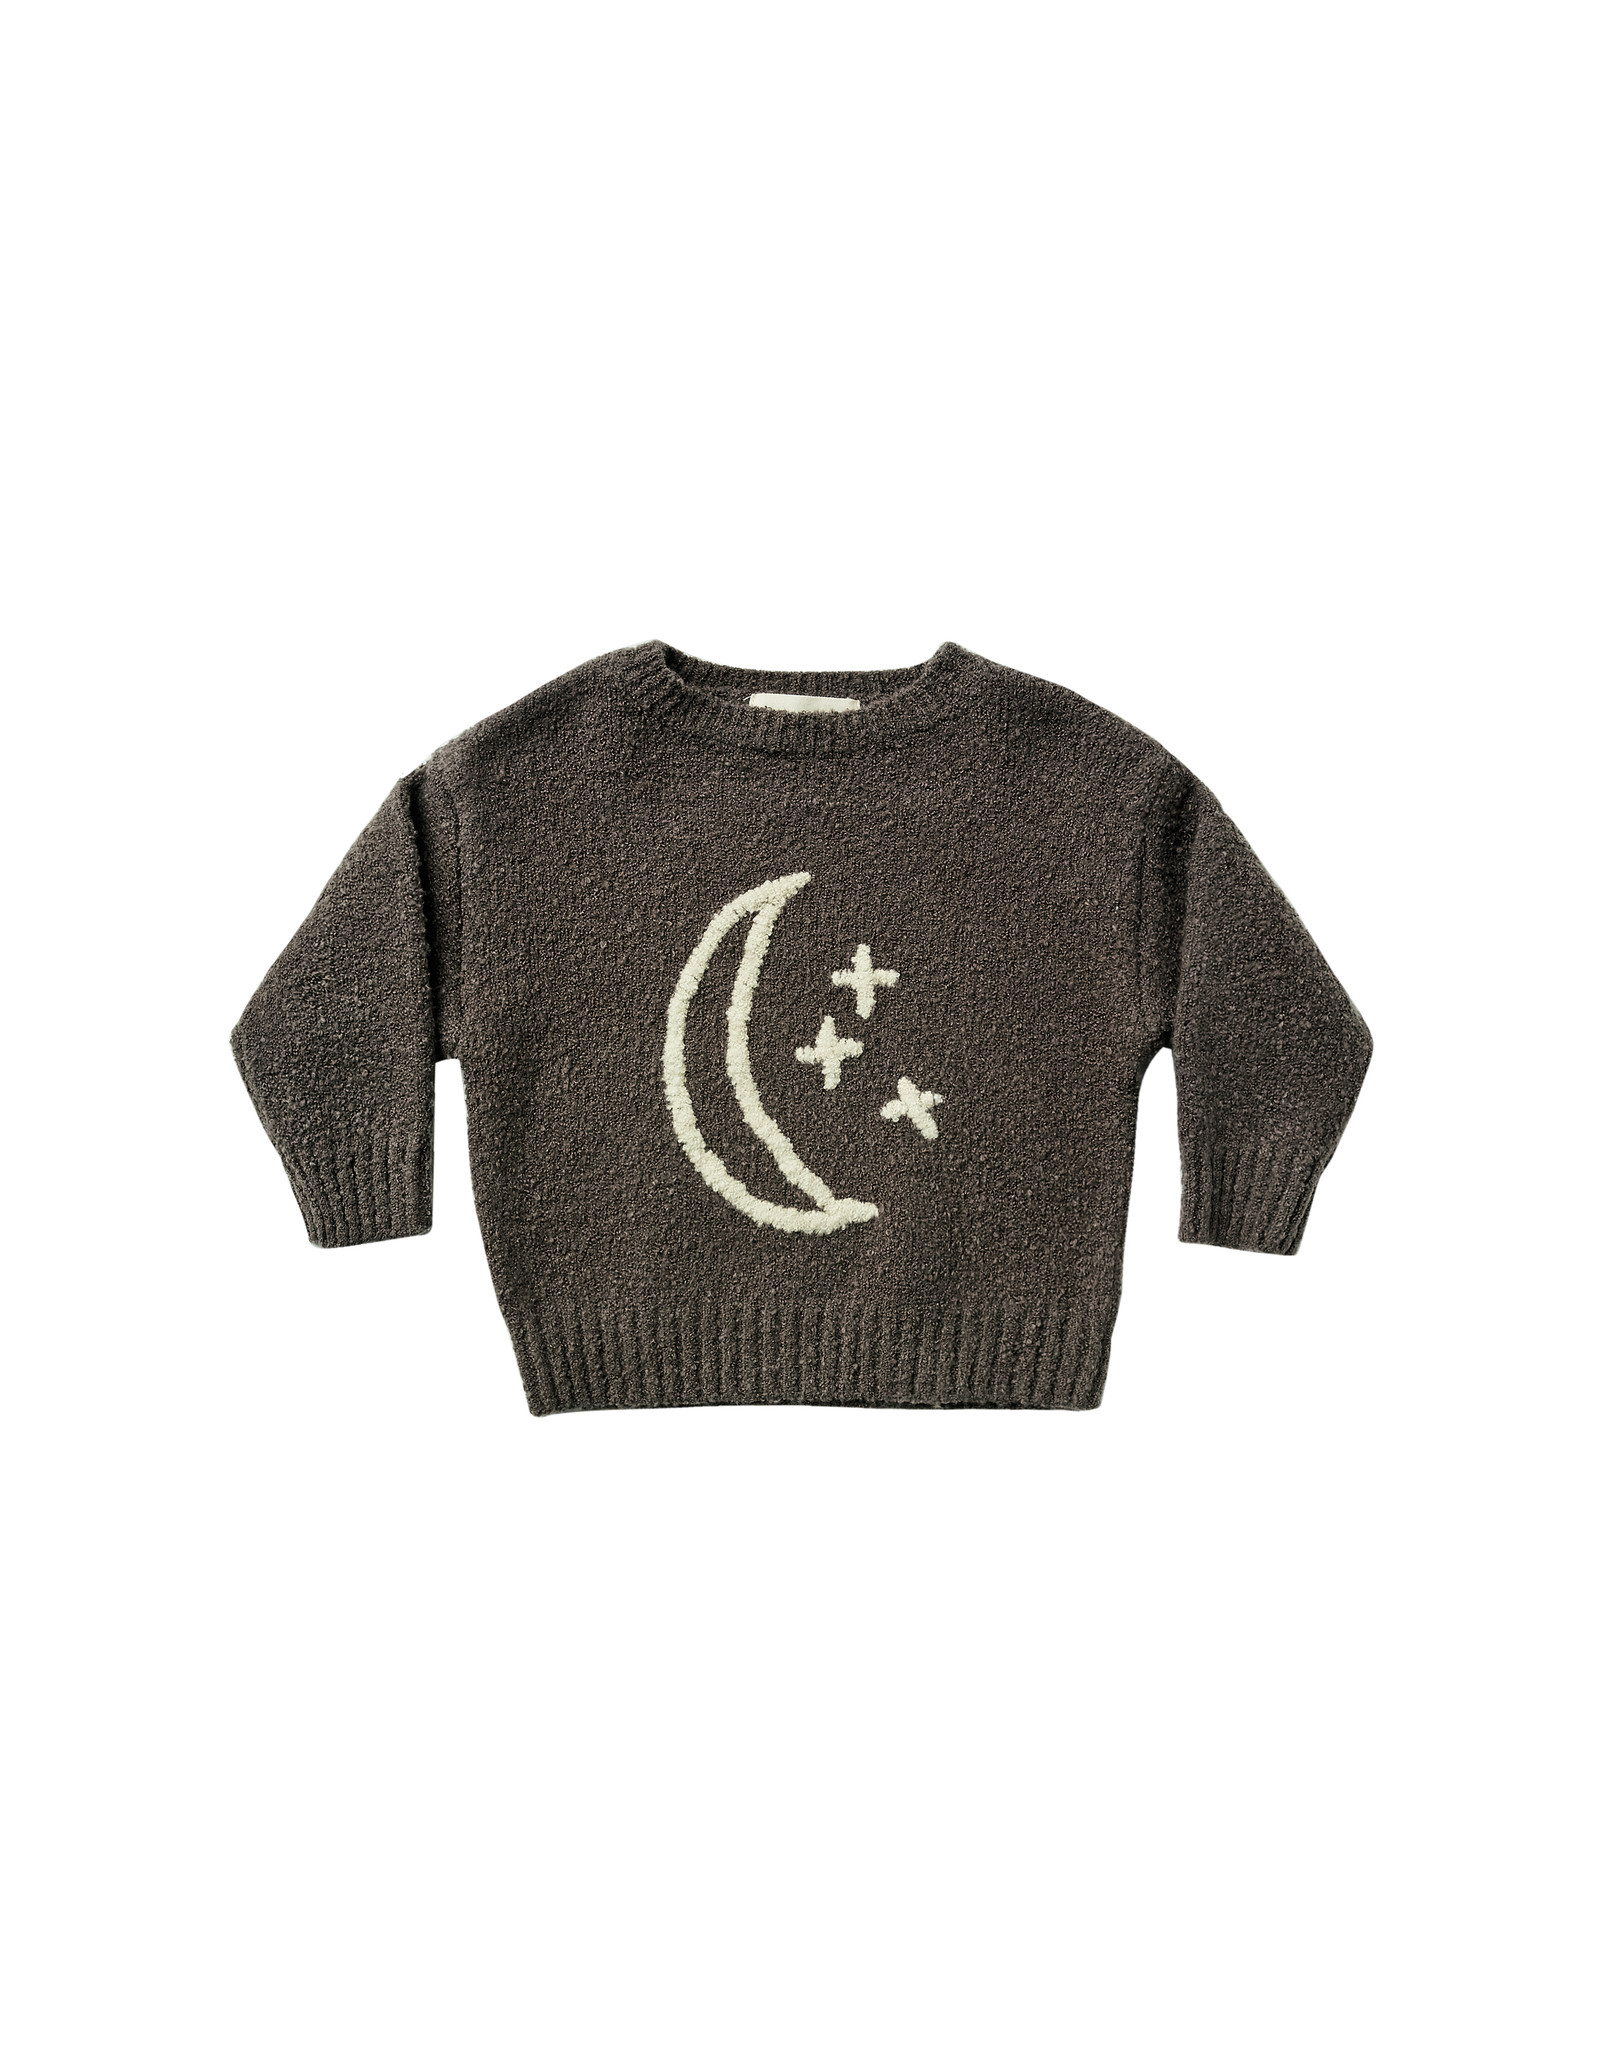 Rylee + Cru Cassidy Sweater